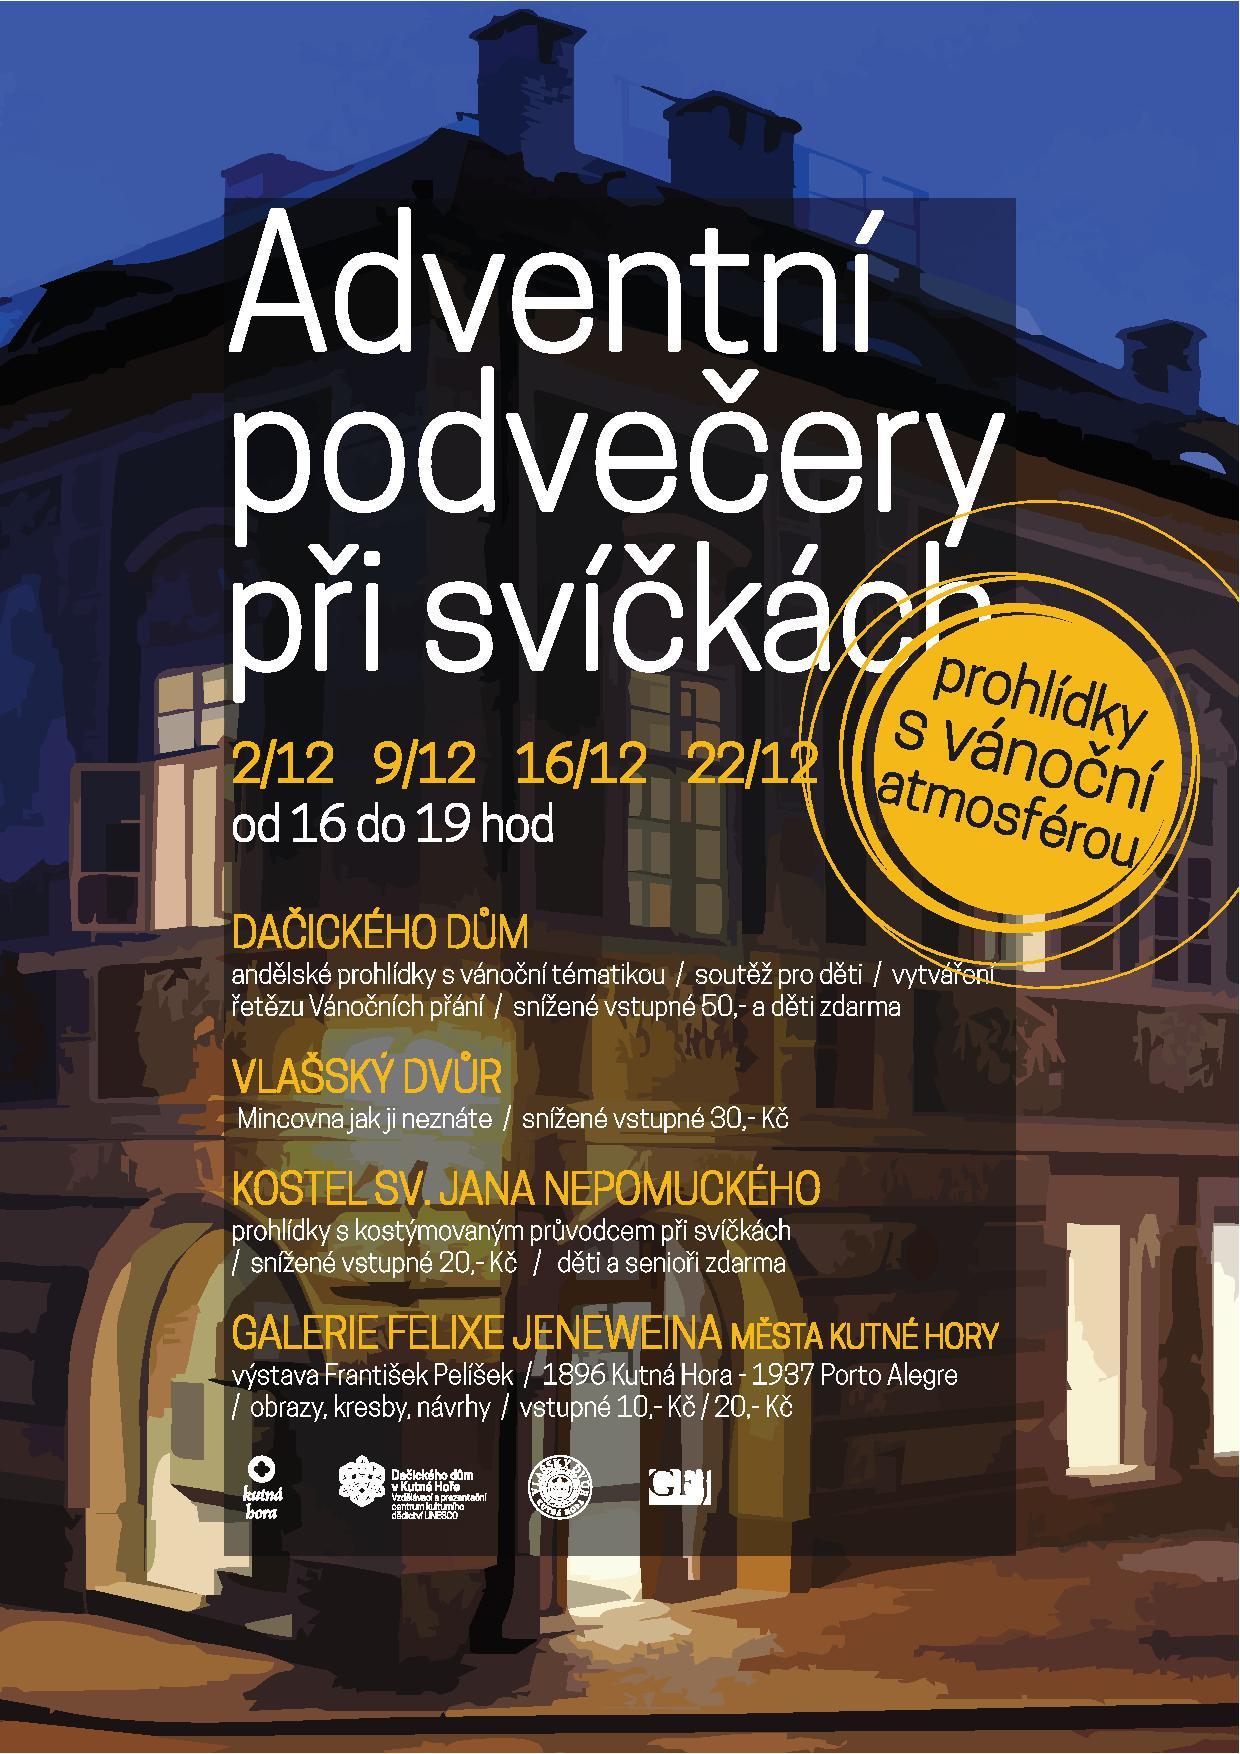 4525-dacickeho-dum-mesto-kh-adventni-podvecery-plakat-03.jpg